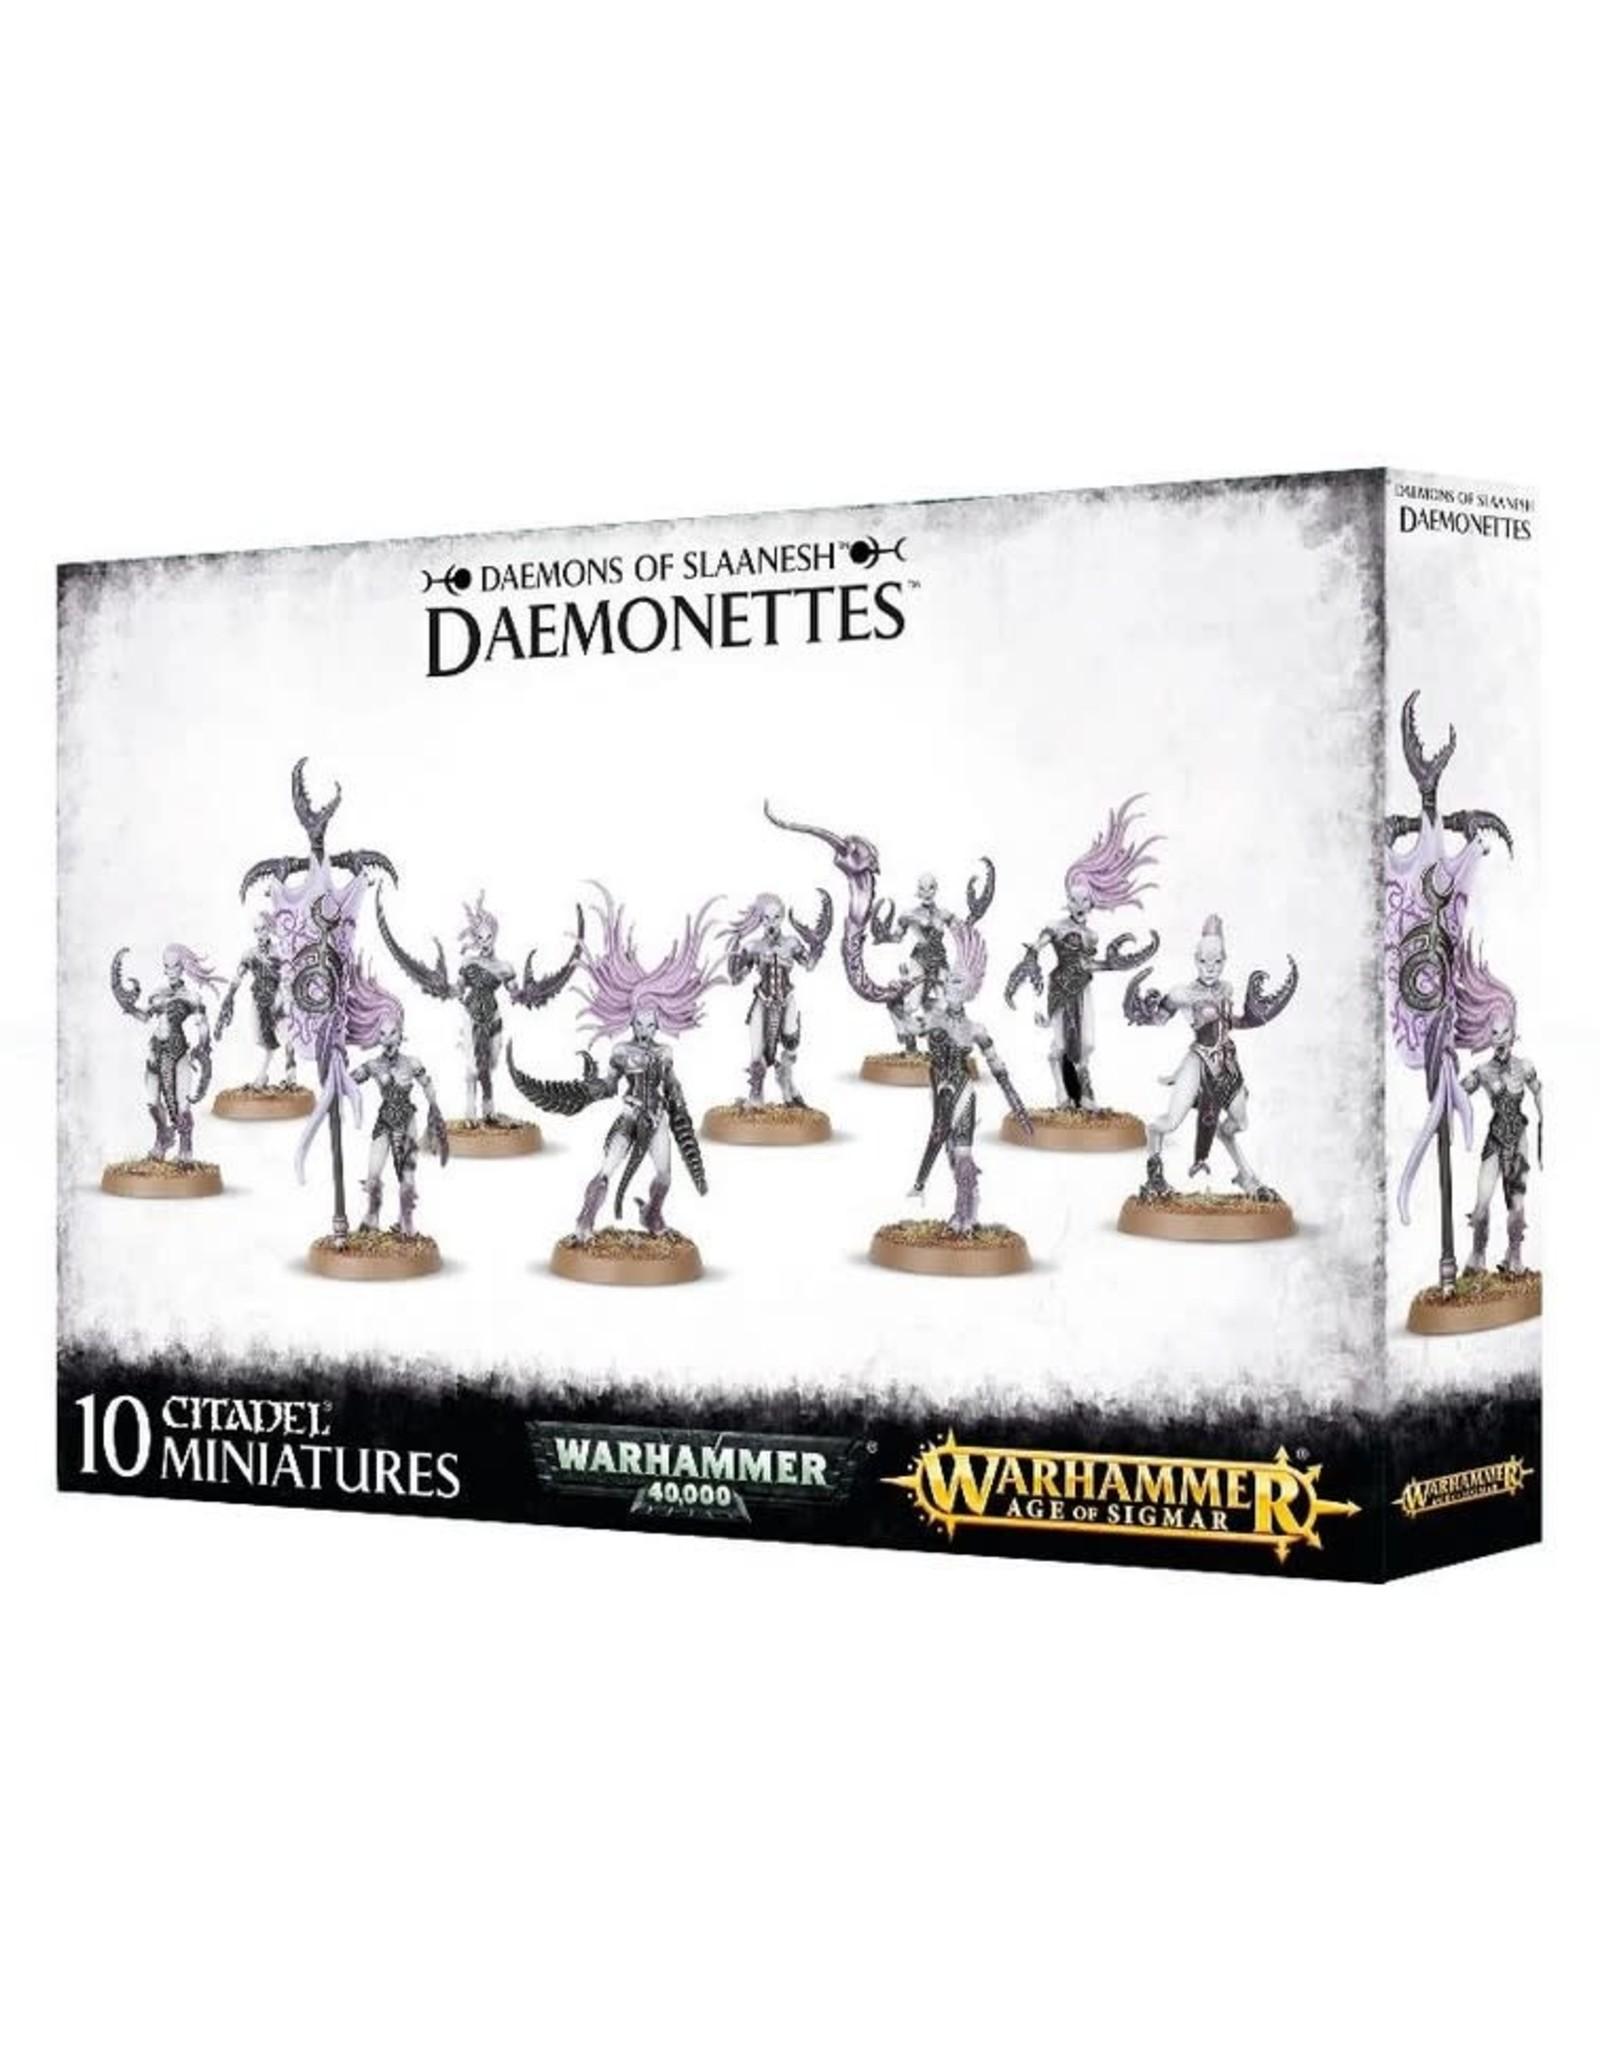 Warhammer AoS WHAoS: Daemons of Slaanesh Daemonettes